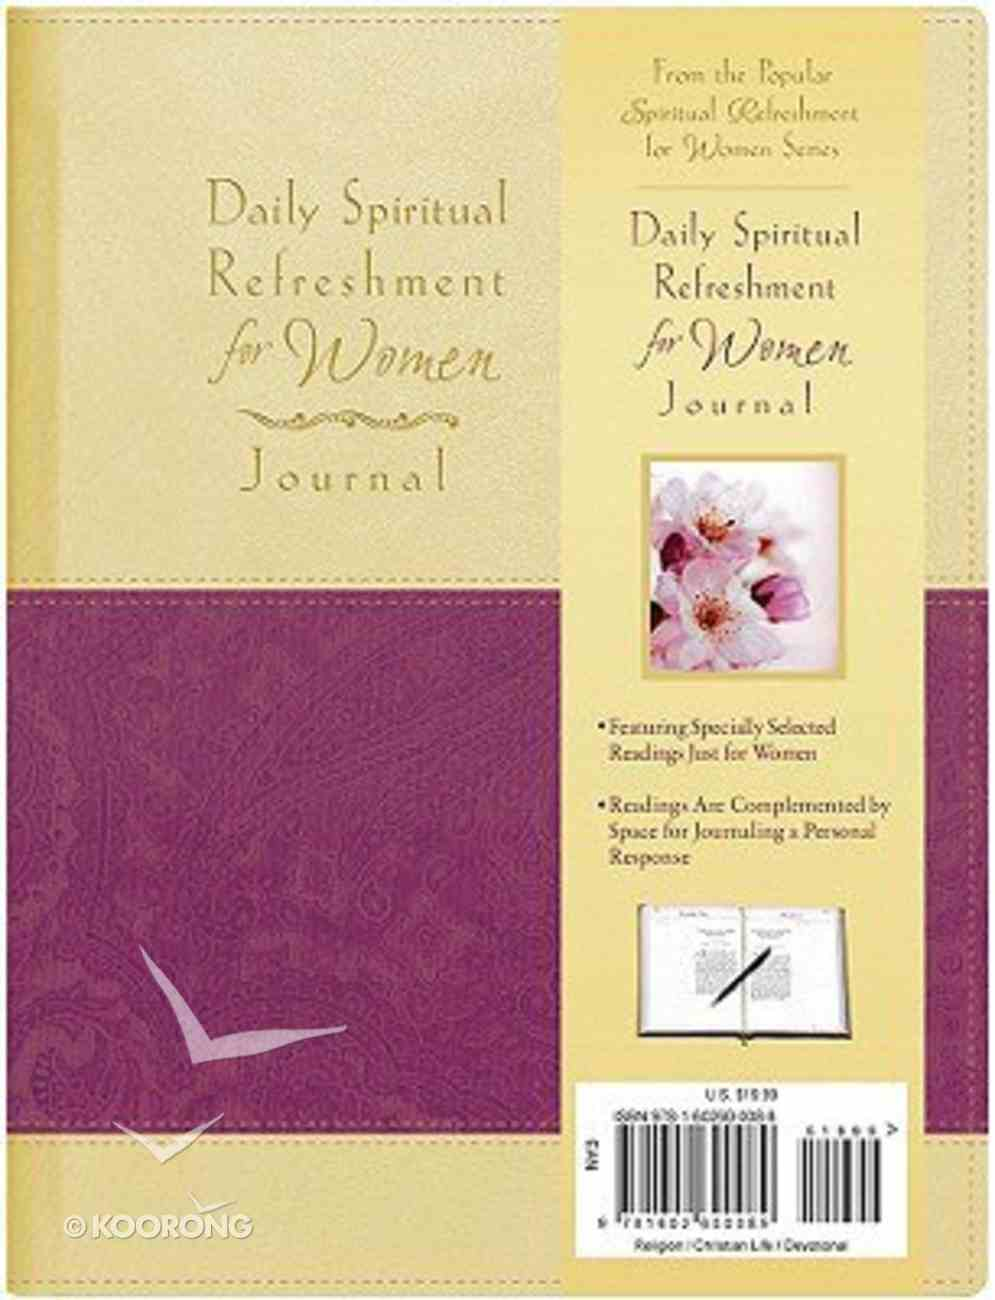 Daily Spiritual Refreshment For Women Journal Imitation Leather